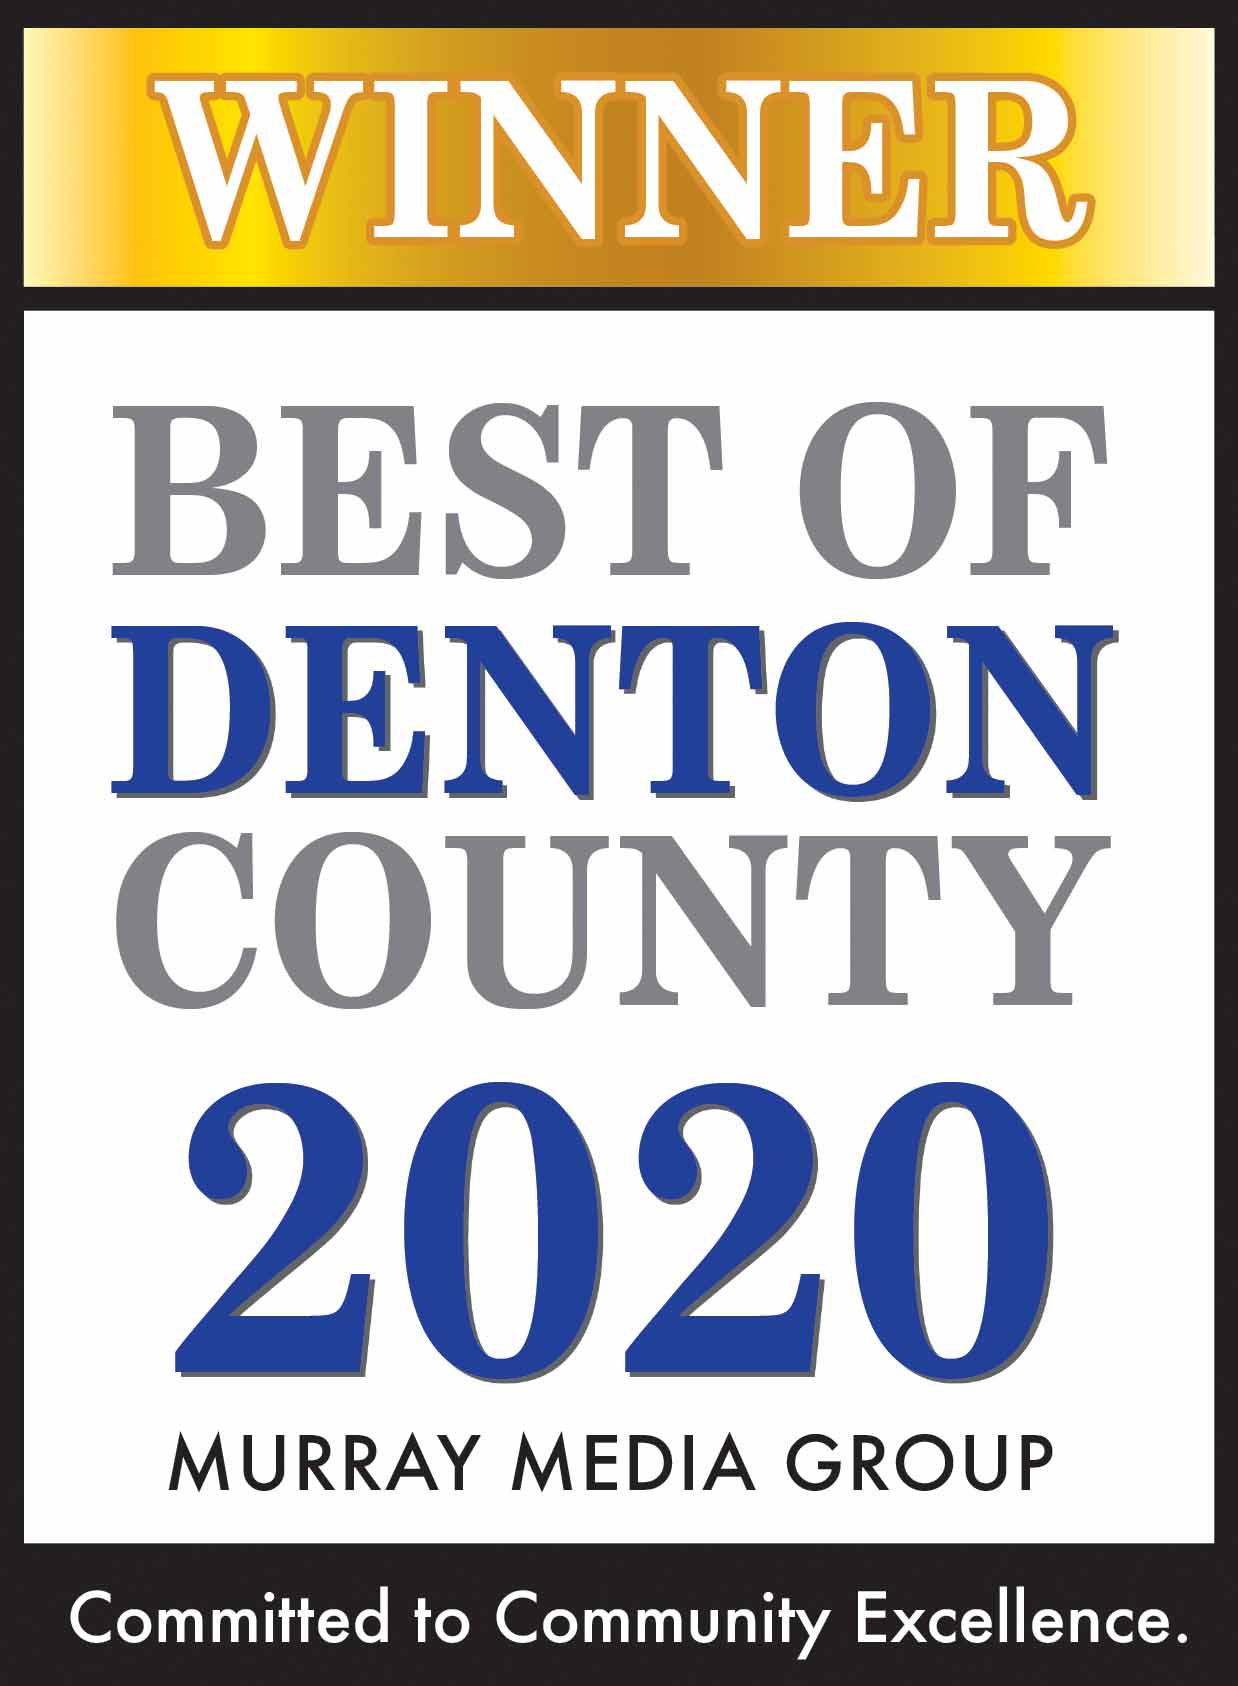 Best of Denton County Award Logo